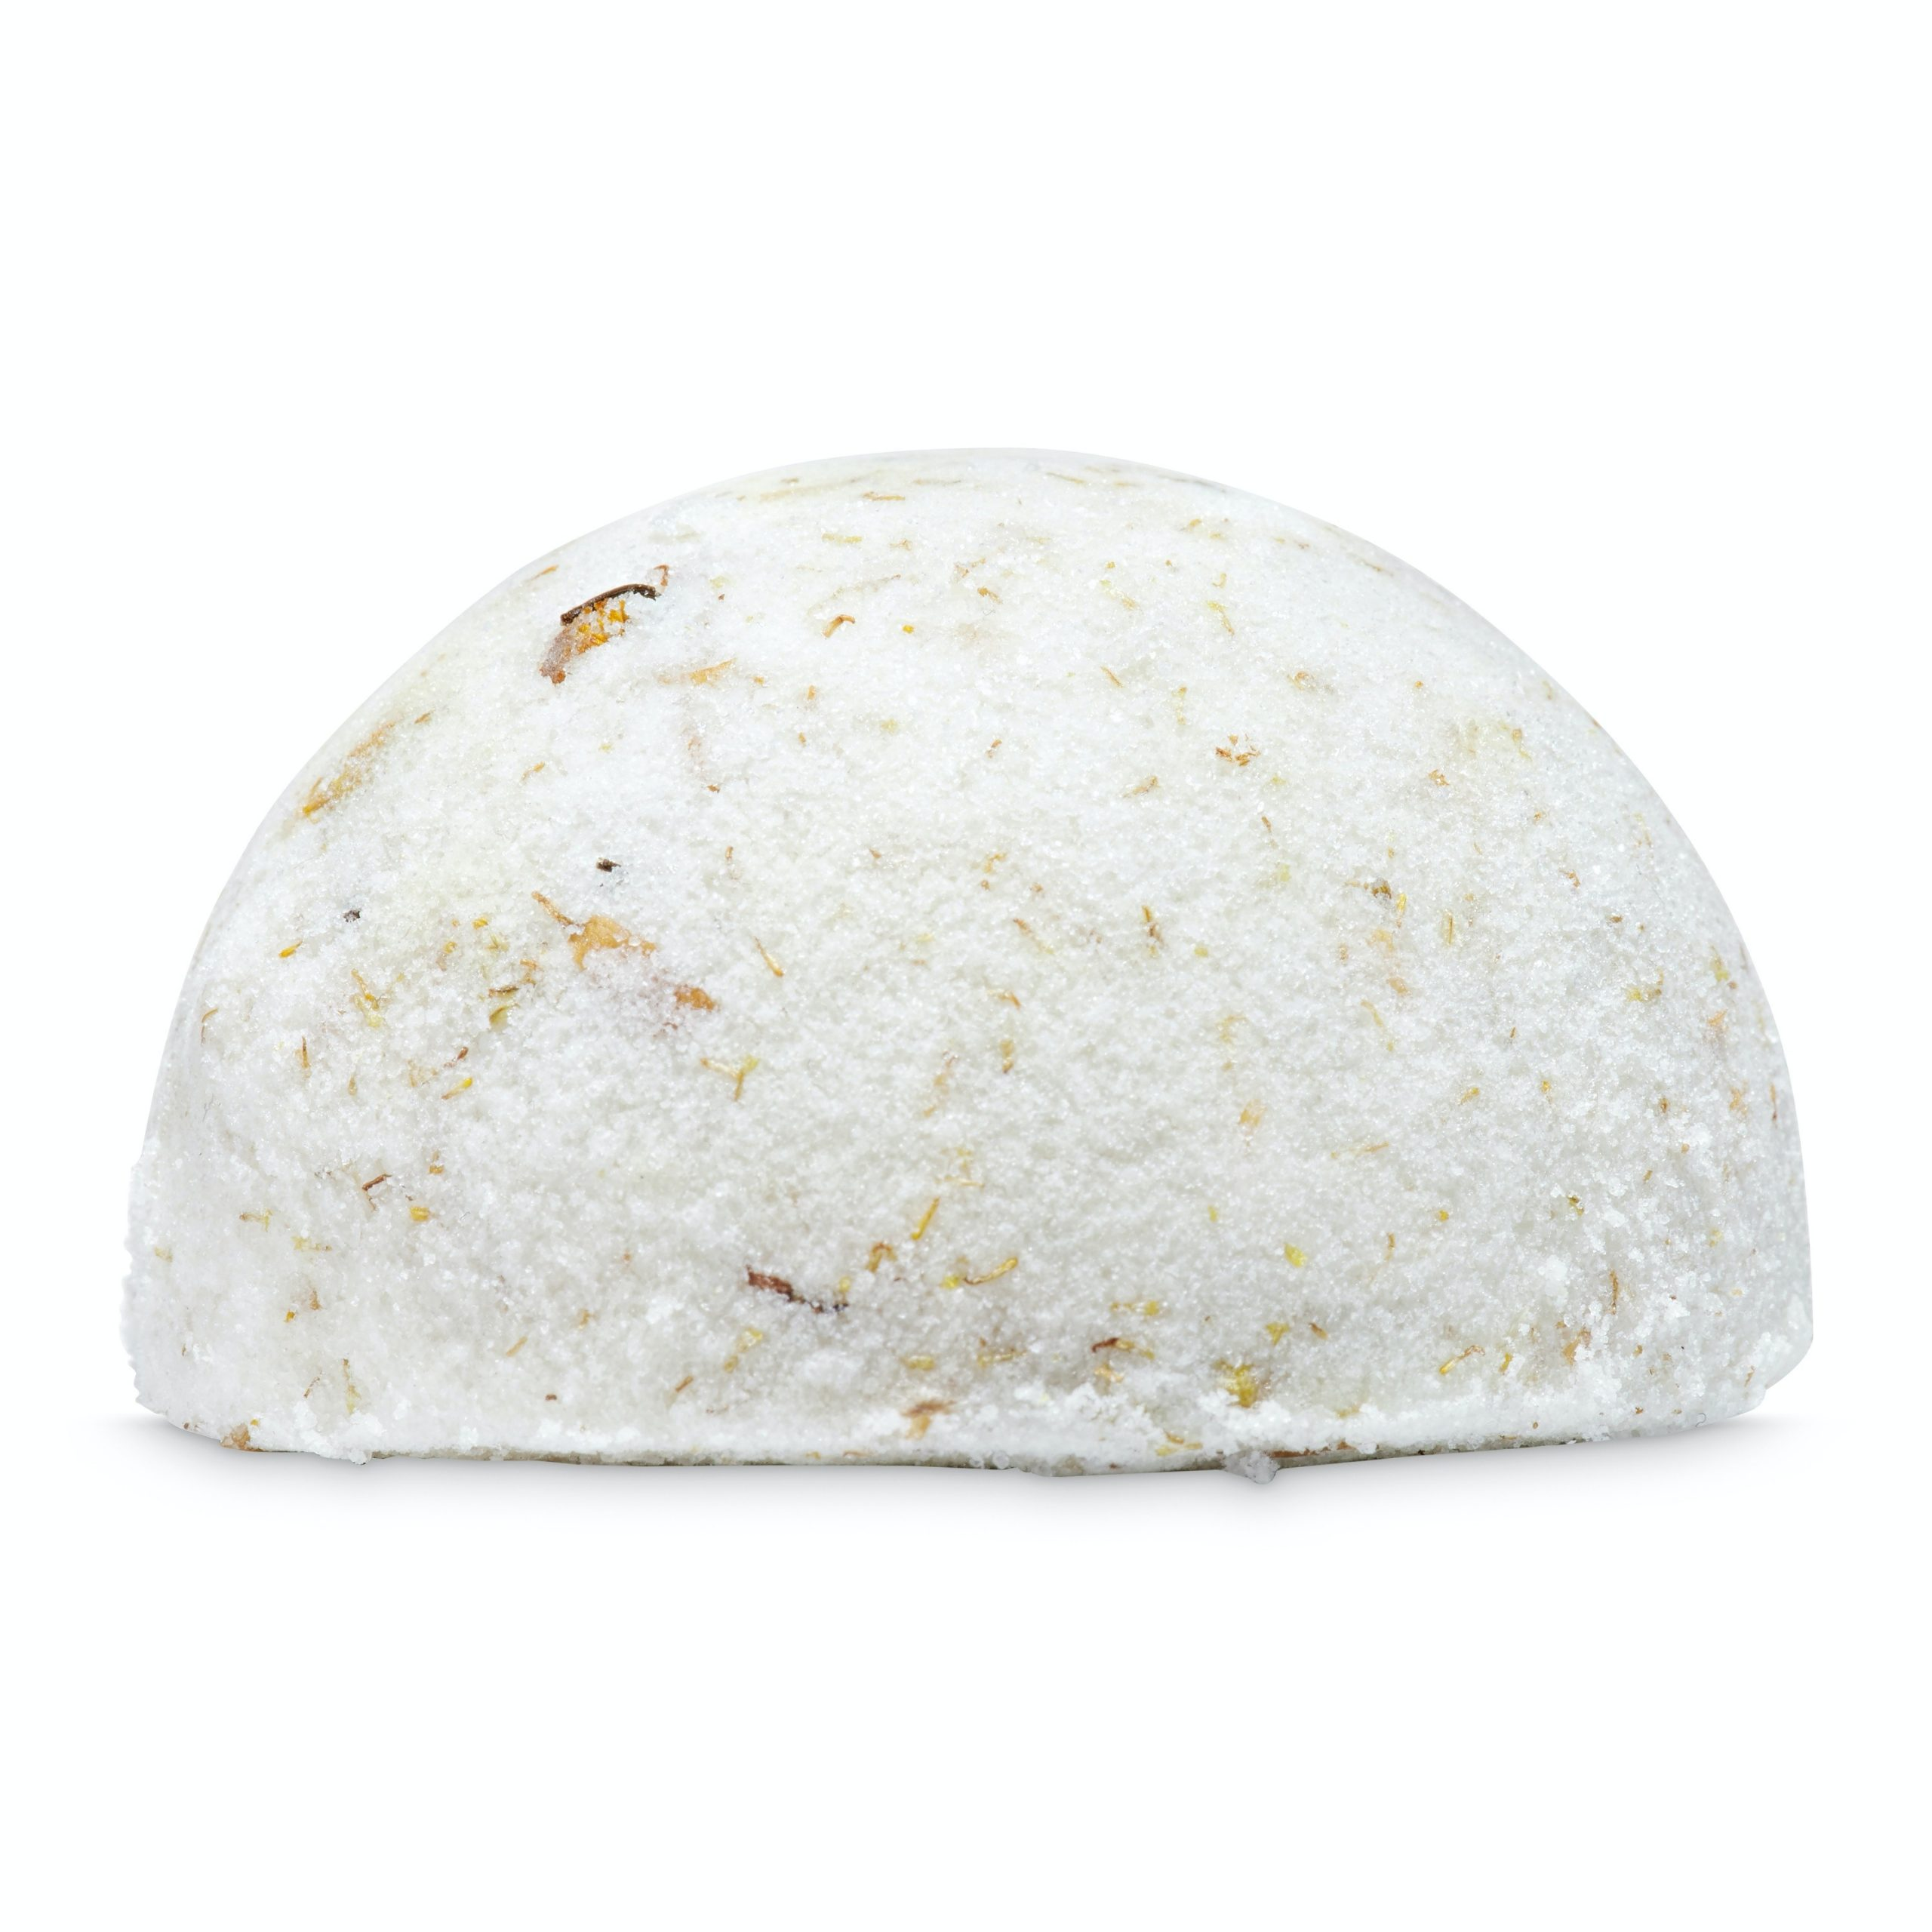 Półkula mleko-miód-owies